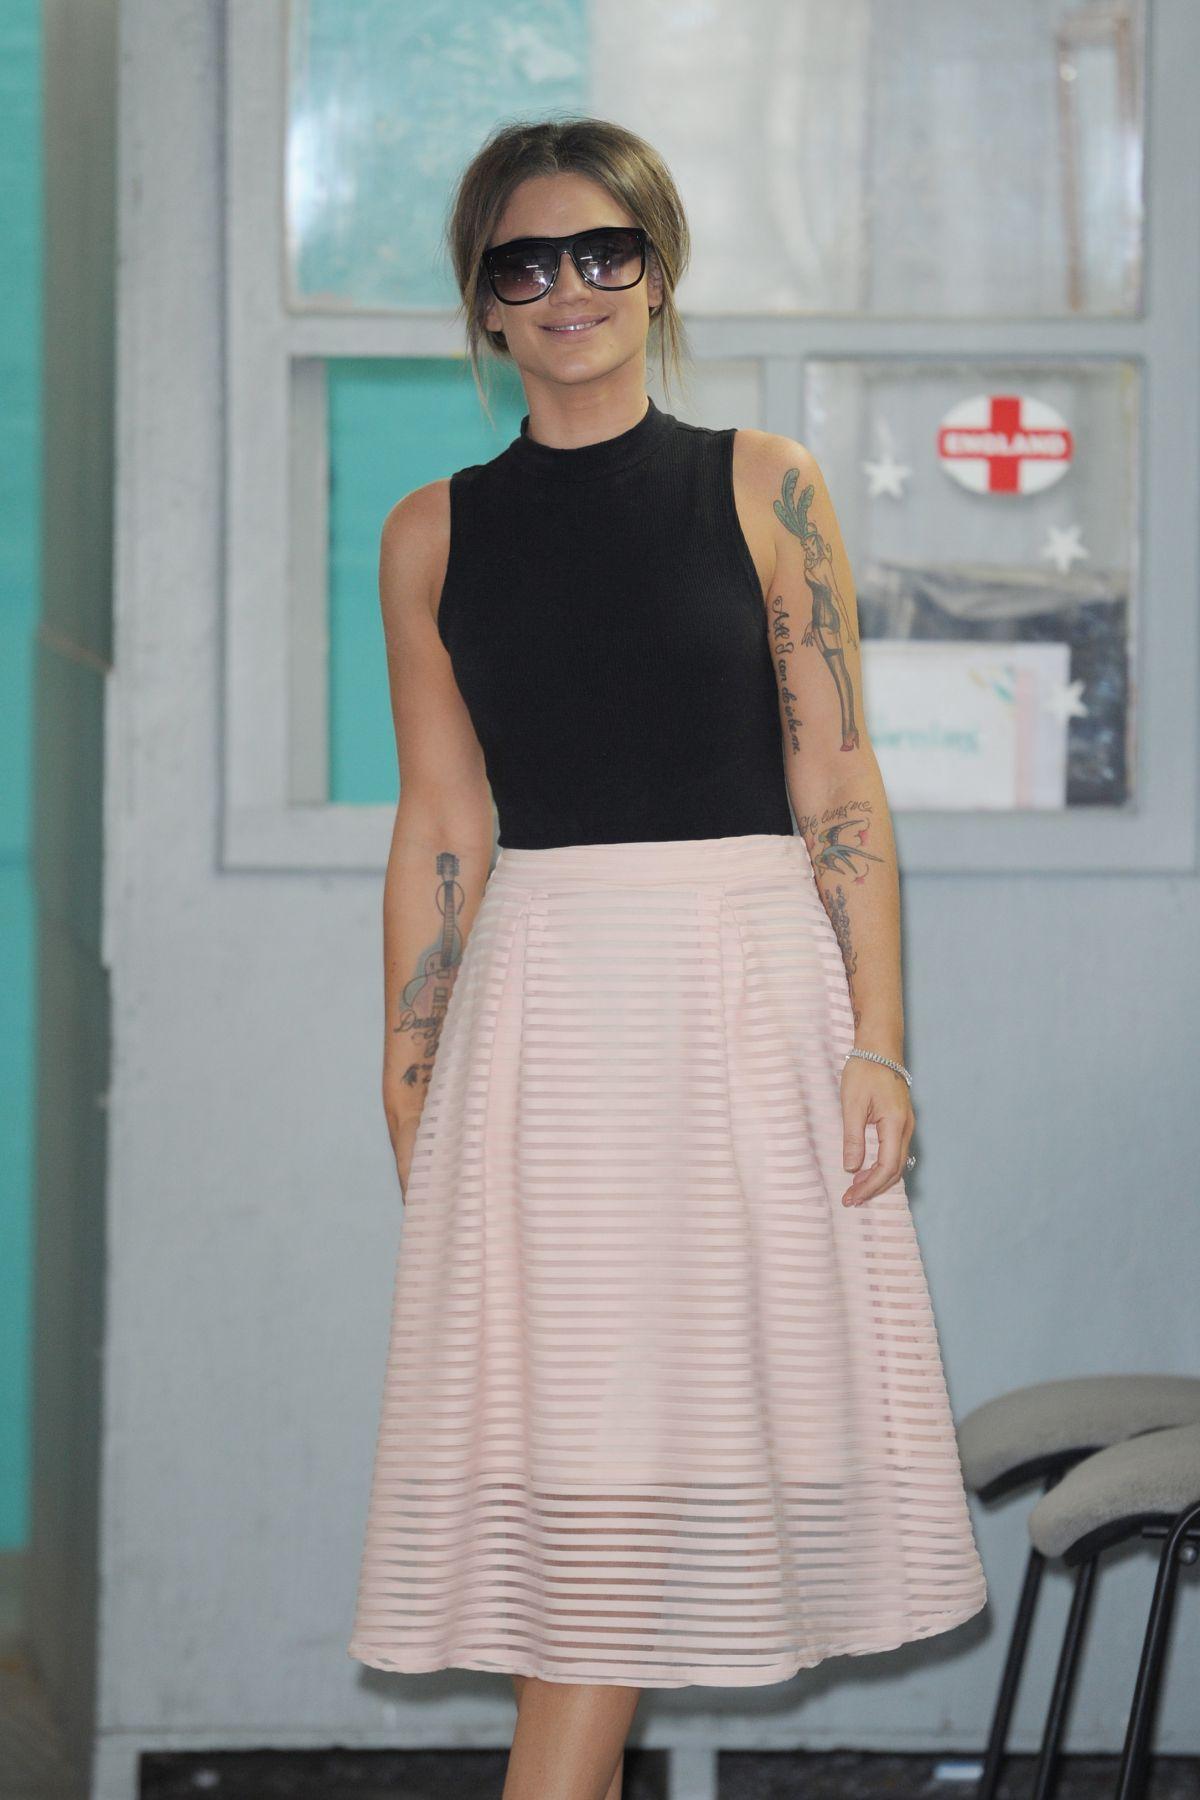 KATIE WAISSEL at ITV Studios in London 08/24/2016